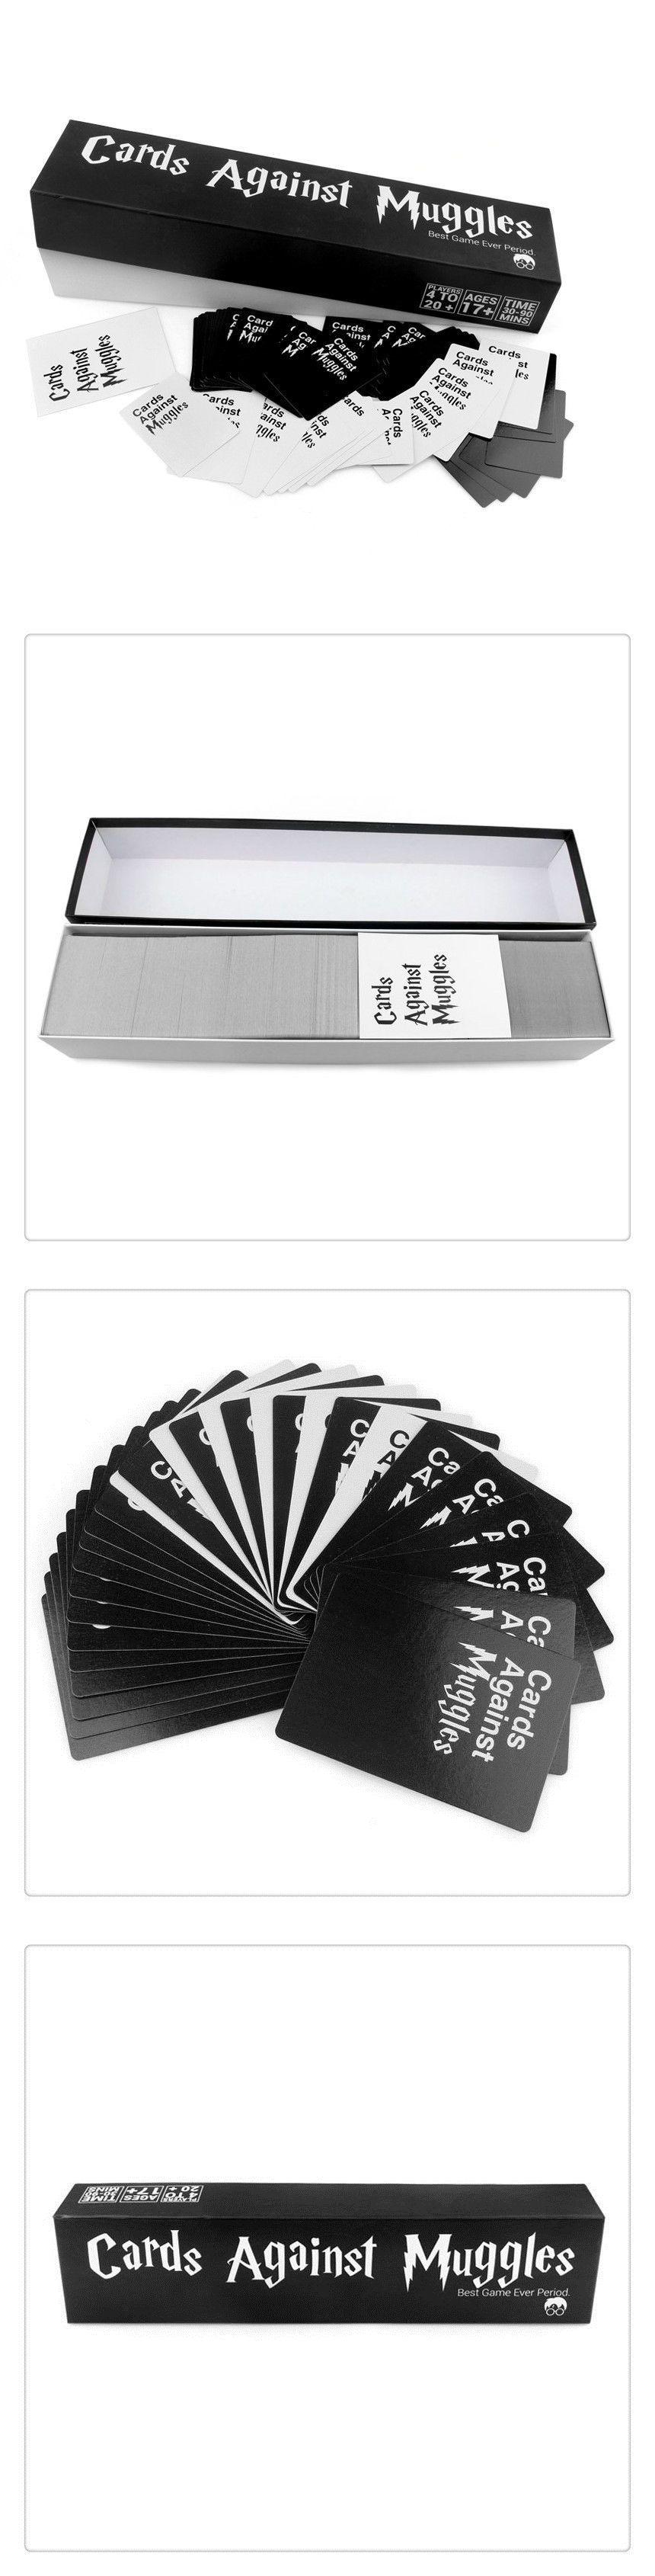 Card gamescontemporary 19082 cards against muggles harry